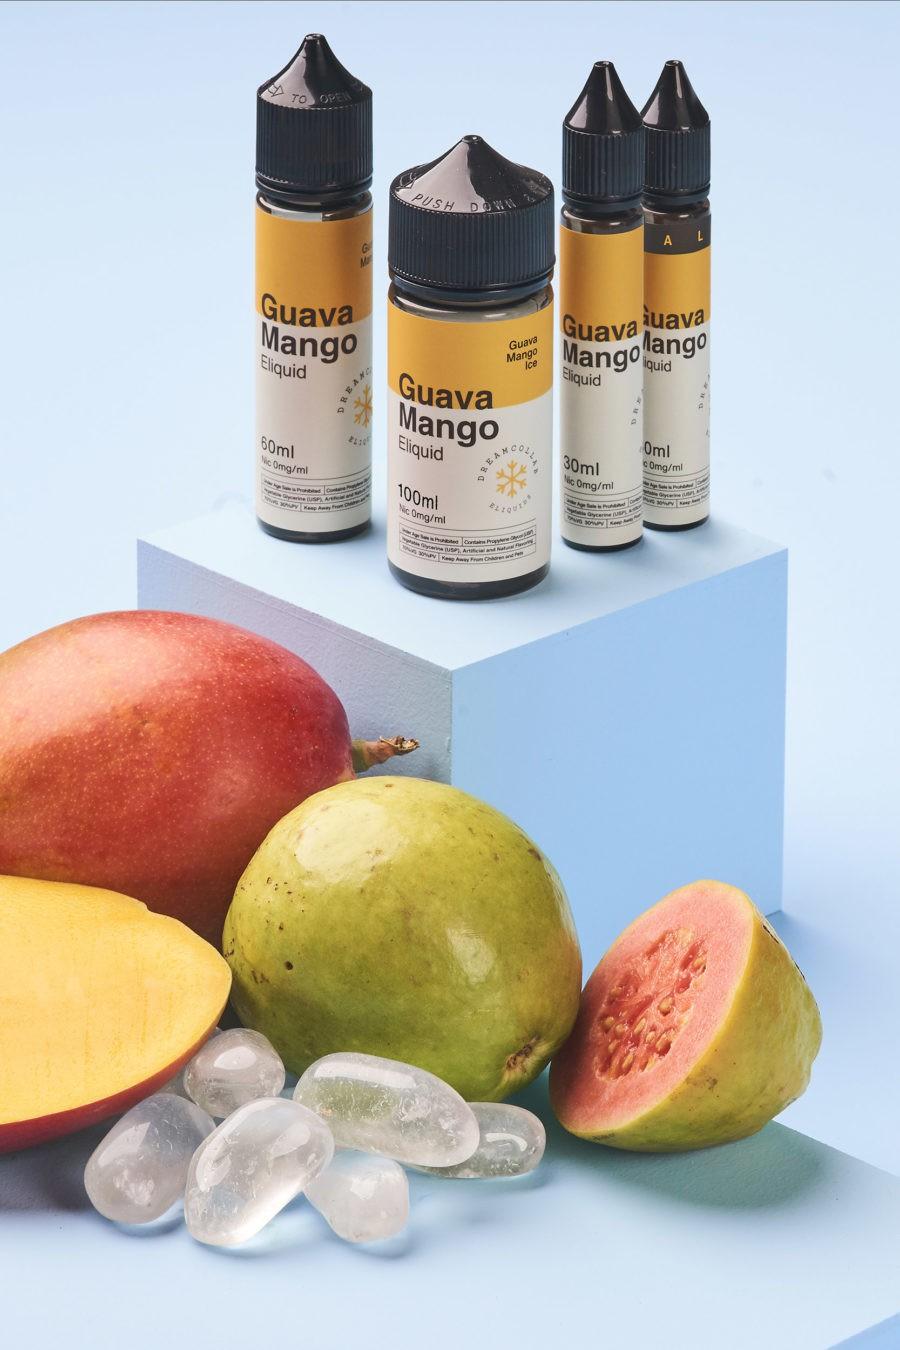 Guava Mango Ice Salt by Dream Collab